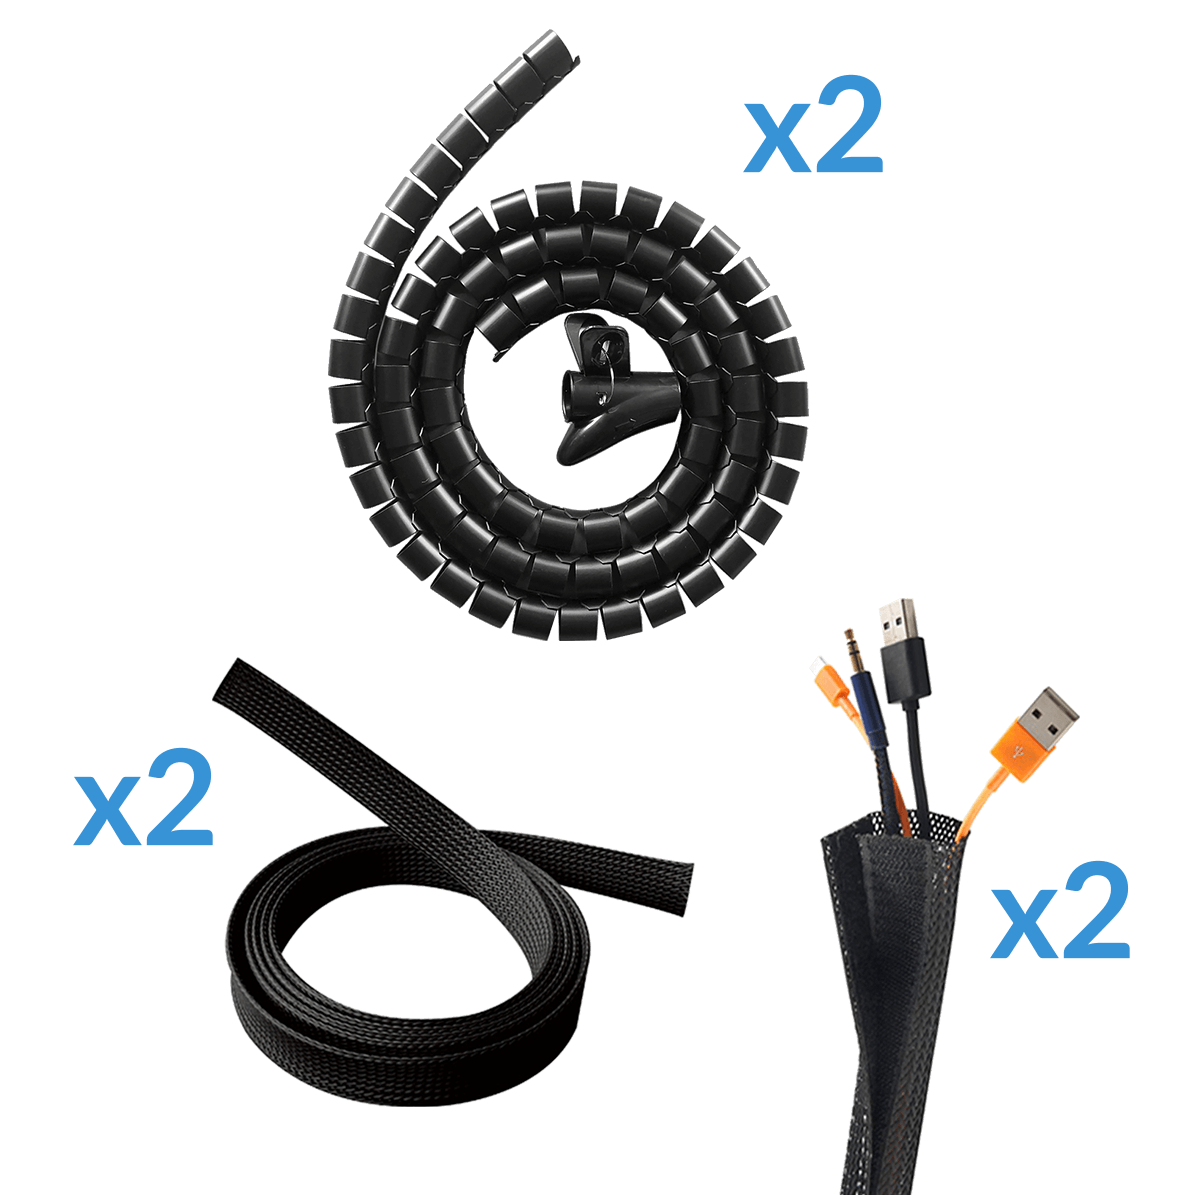 UVI Cable Management